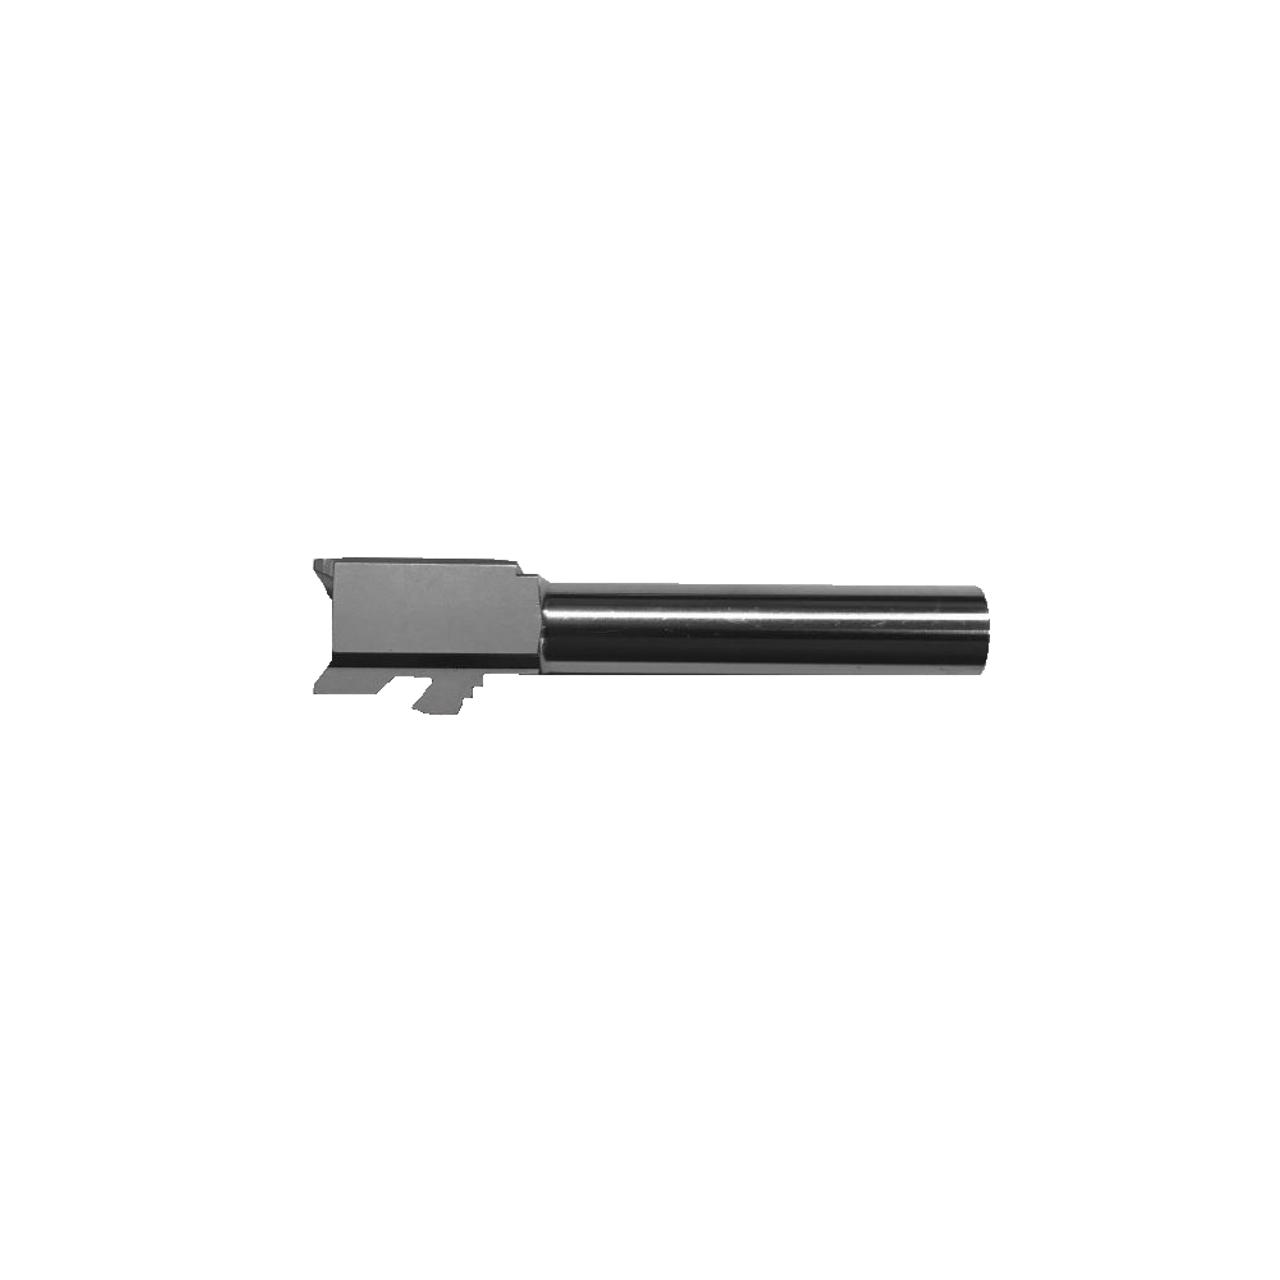 Stainless Steel Barrel For Glock 19